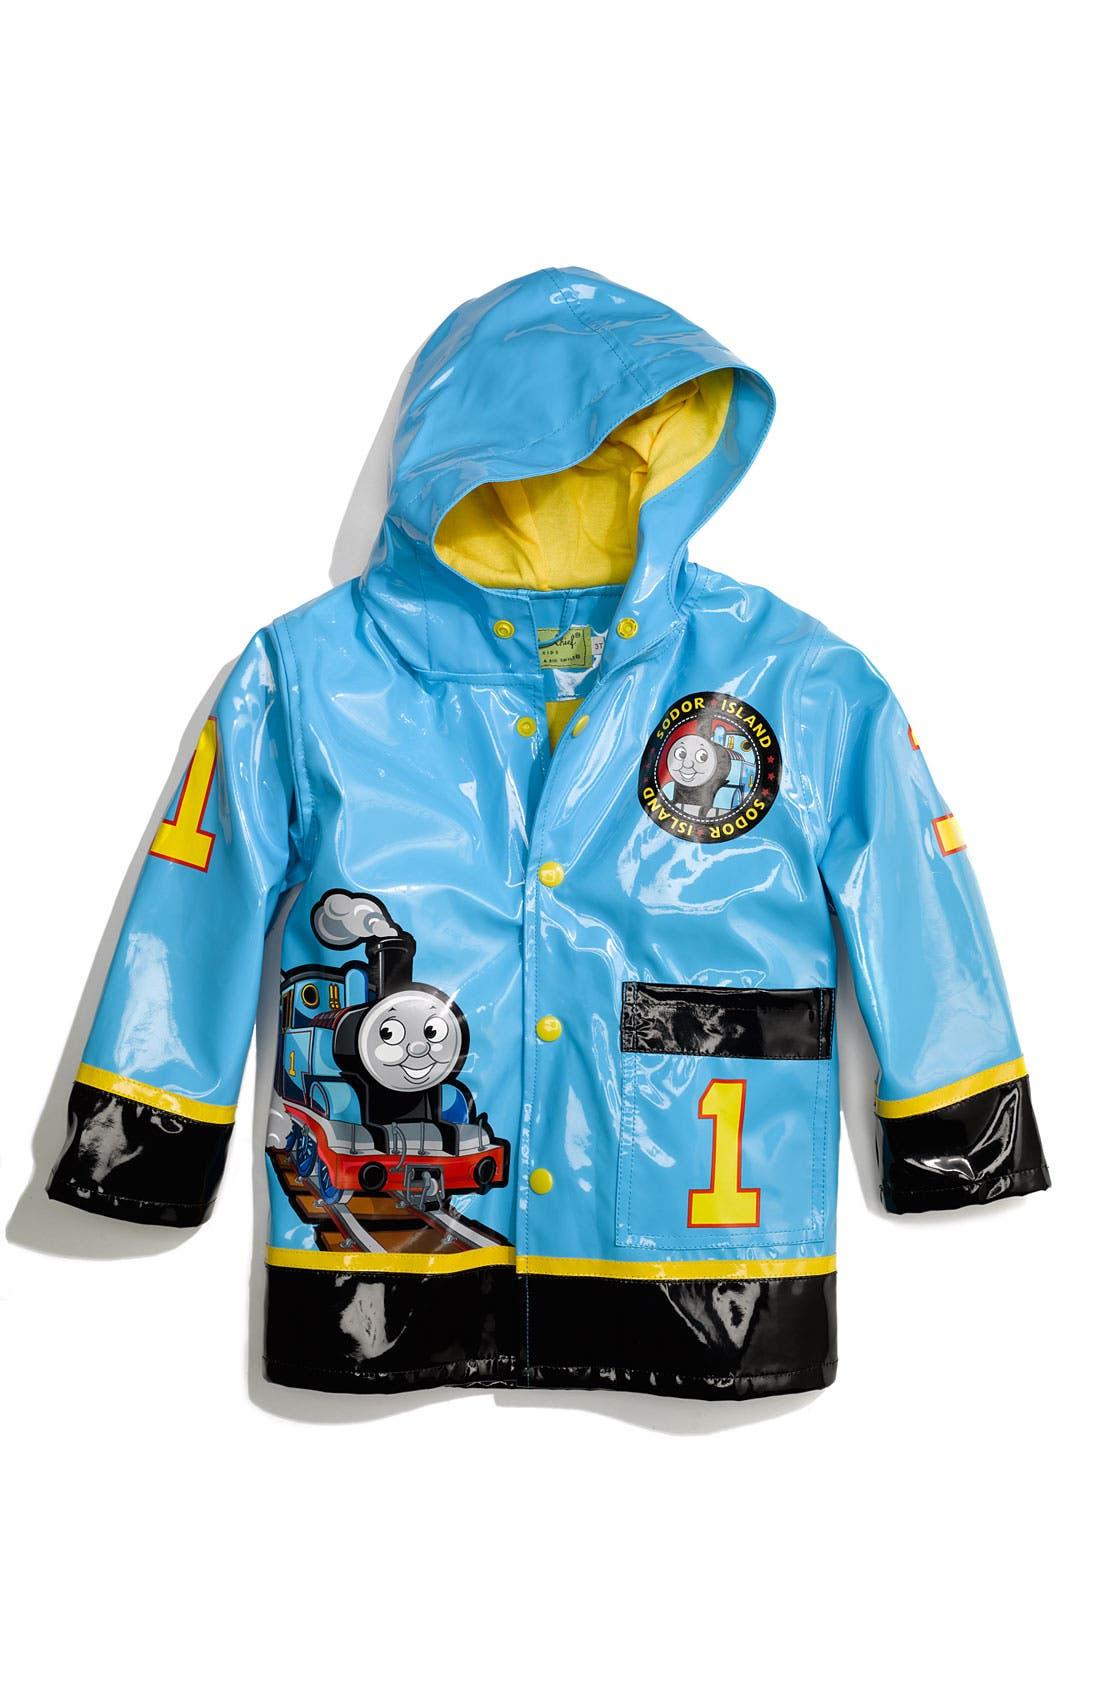 Main Image - Western Chief 'Thomas the Tank Engine®' Raincoat (Toddler Boys & Little Boys)